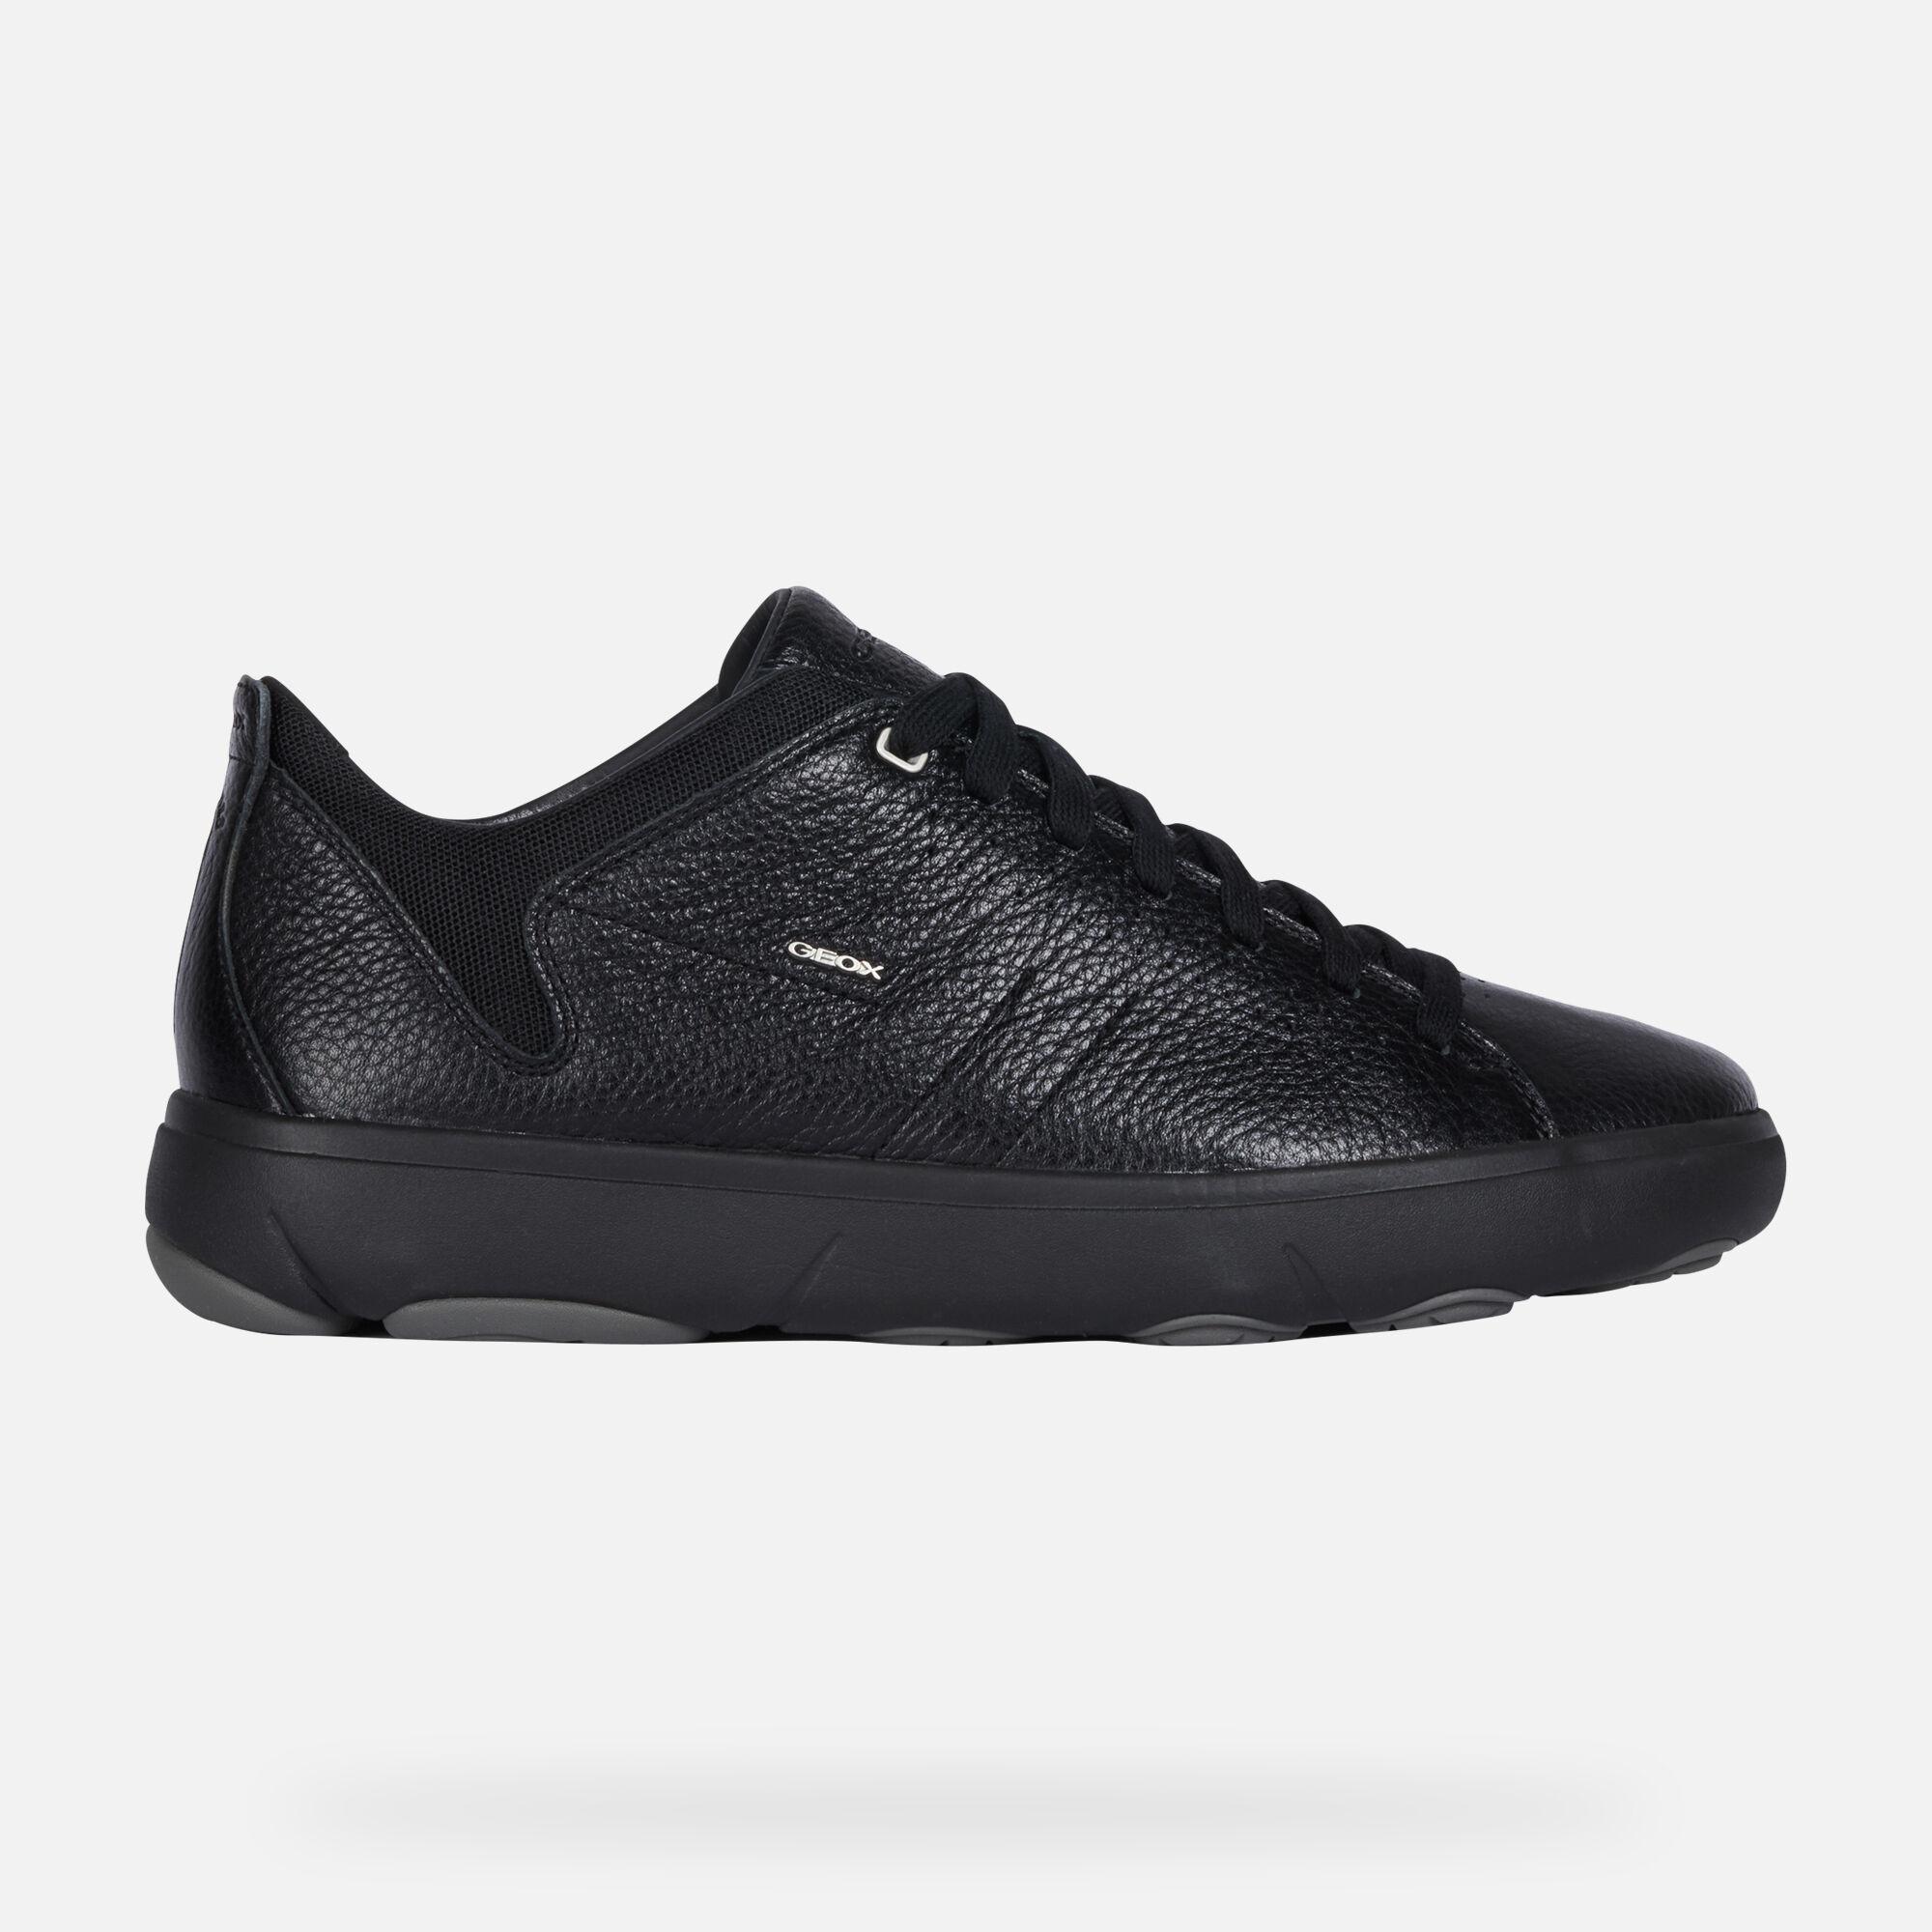 NEBULA Y Herr Schwarze Atmungsaktiver Schuhe | Geox ®